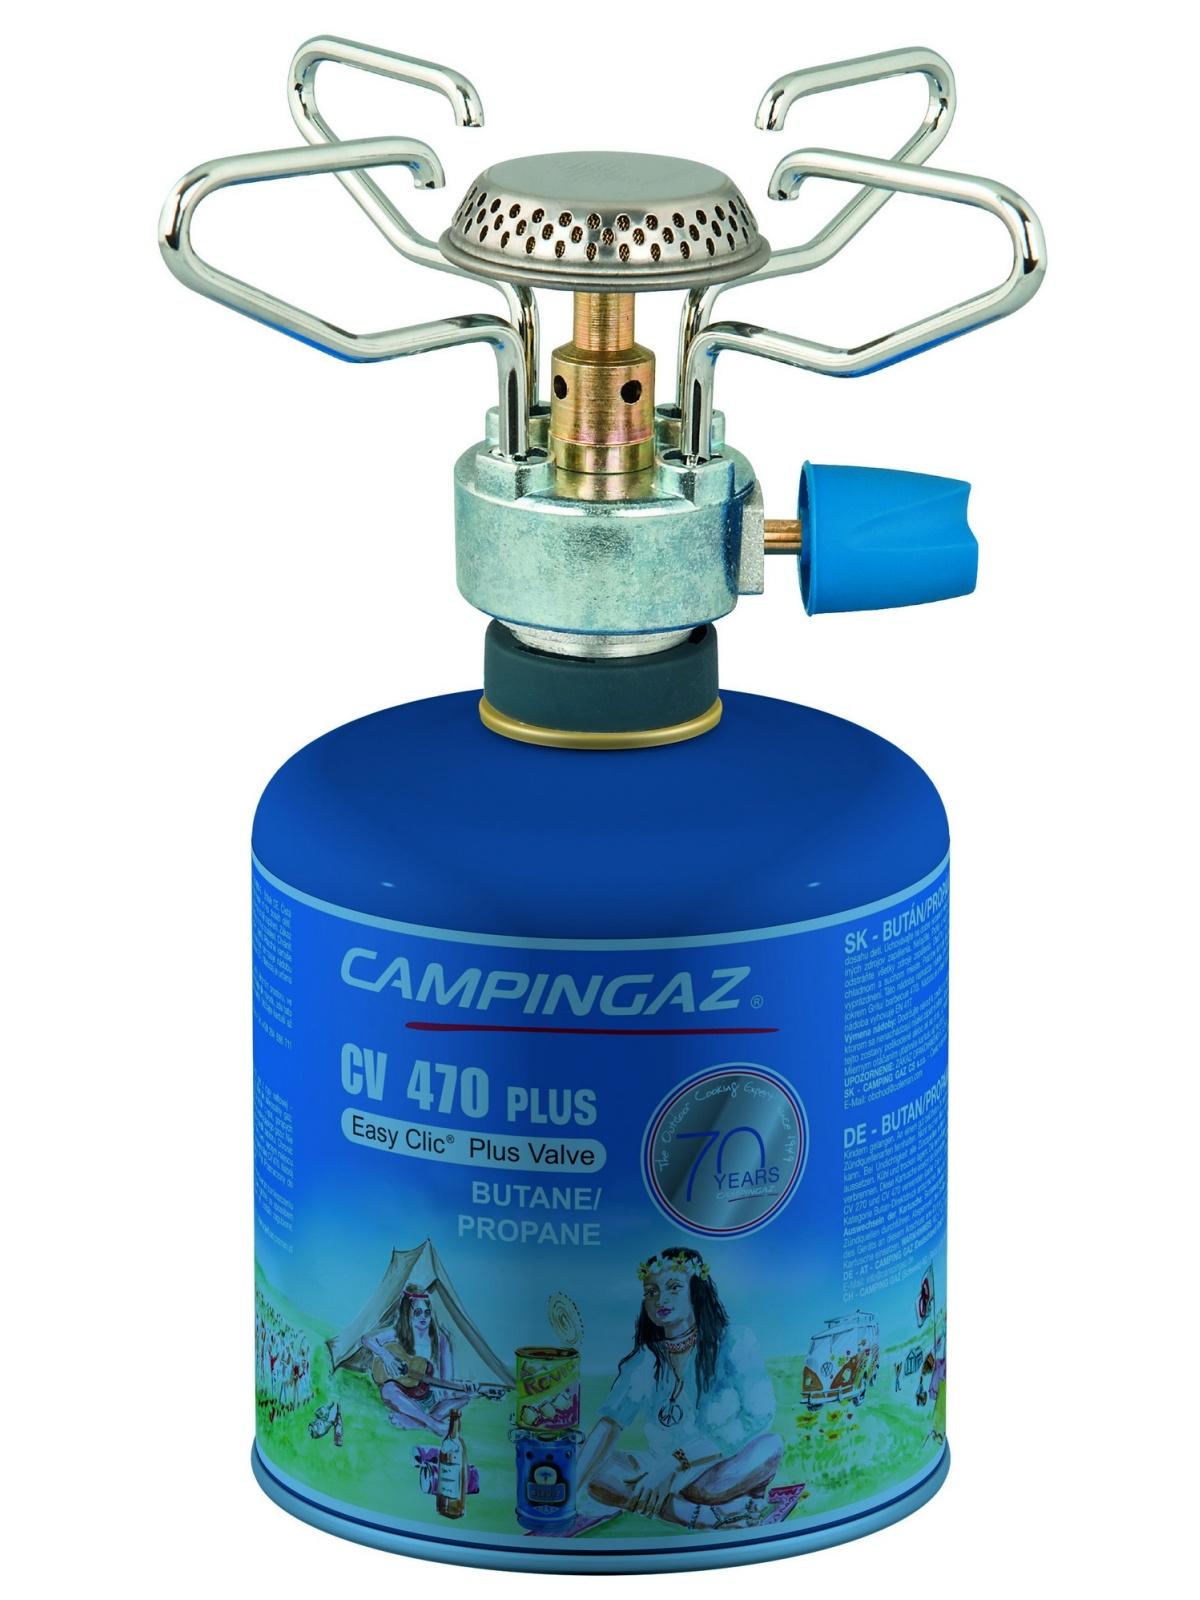 Plynový varič CAMPINGAZ Bleuet Micro Plus s kartušou CV 470 plus